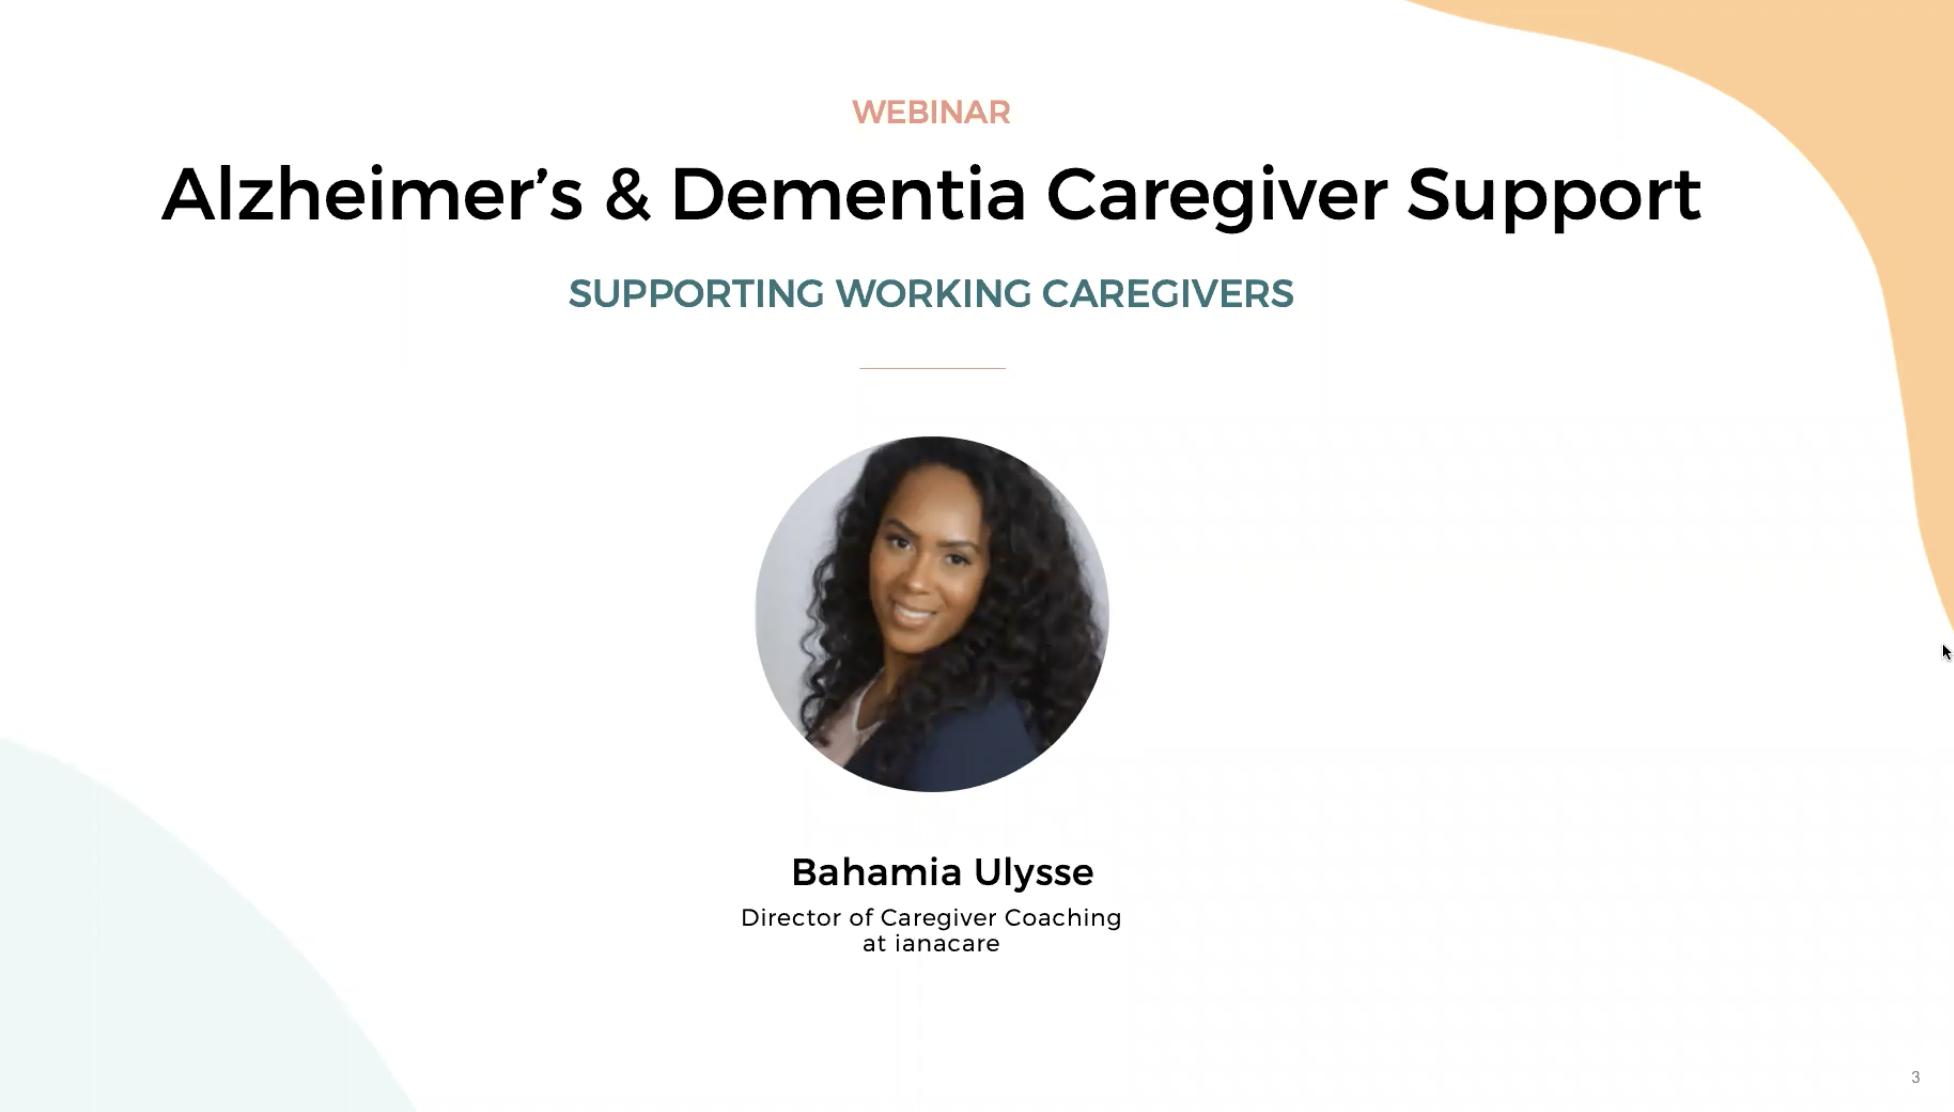 Watch:Alzheimer's & Dementia Caregiver Support